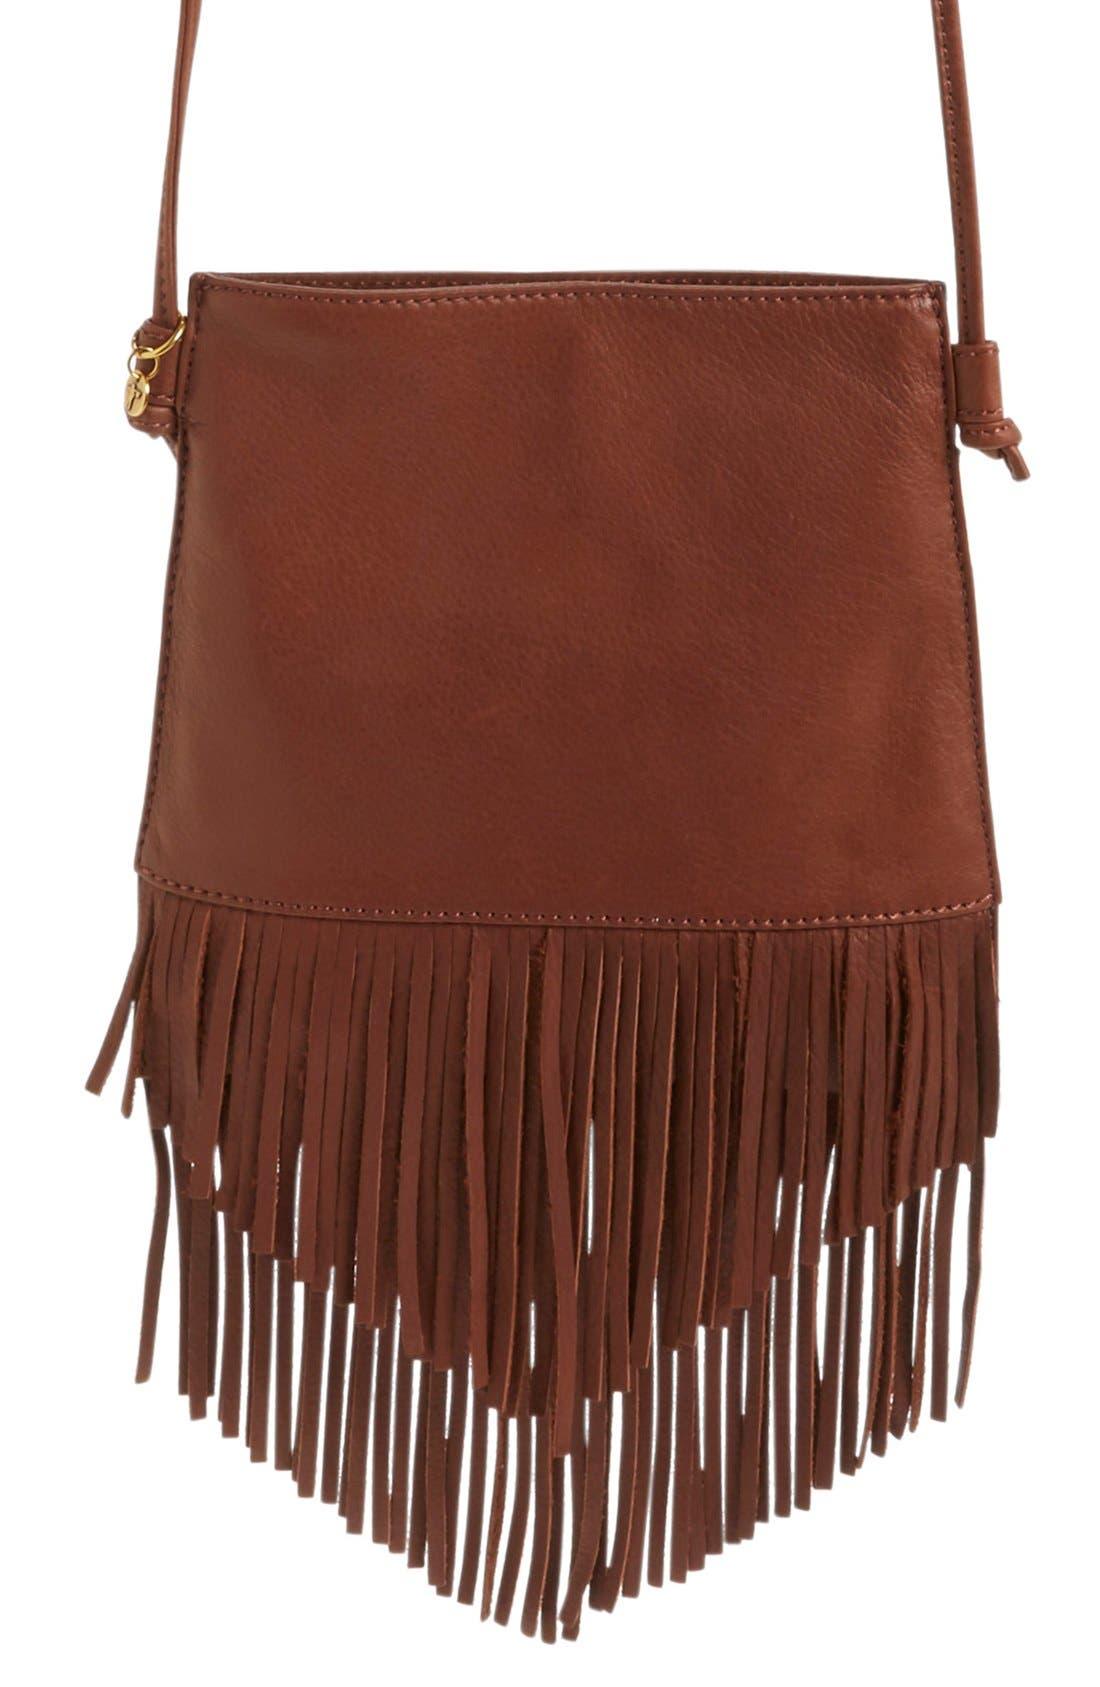 Alternate Image 1 Selected - Hobo 'Meadow' Crossbody Bag